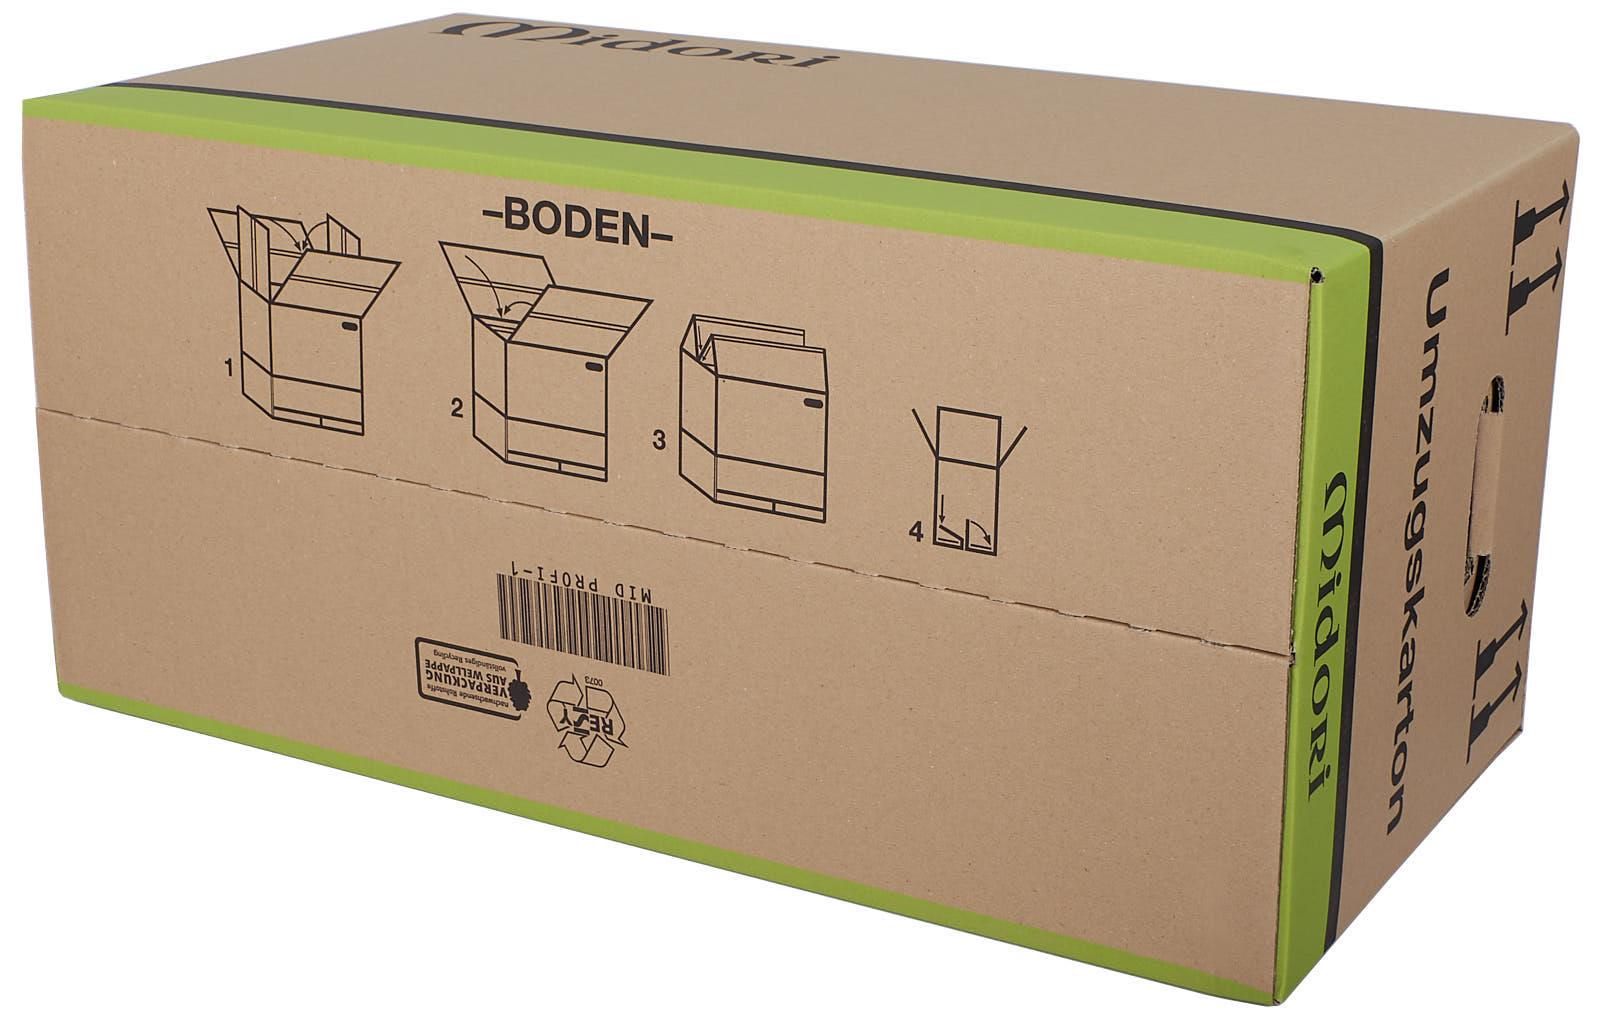 umzugskartons midori profi 2 wellig 630 x 285 x 305mm. Black Bedroom Furniture Sets. Home Design Ideas